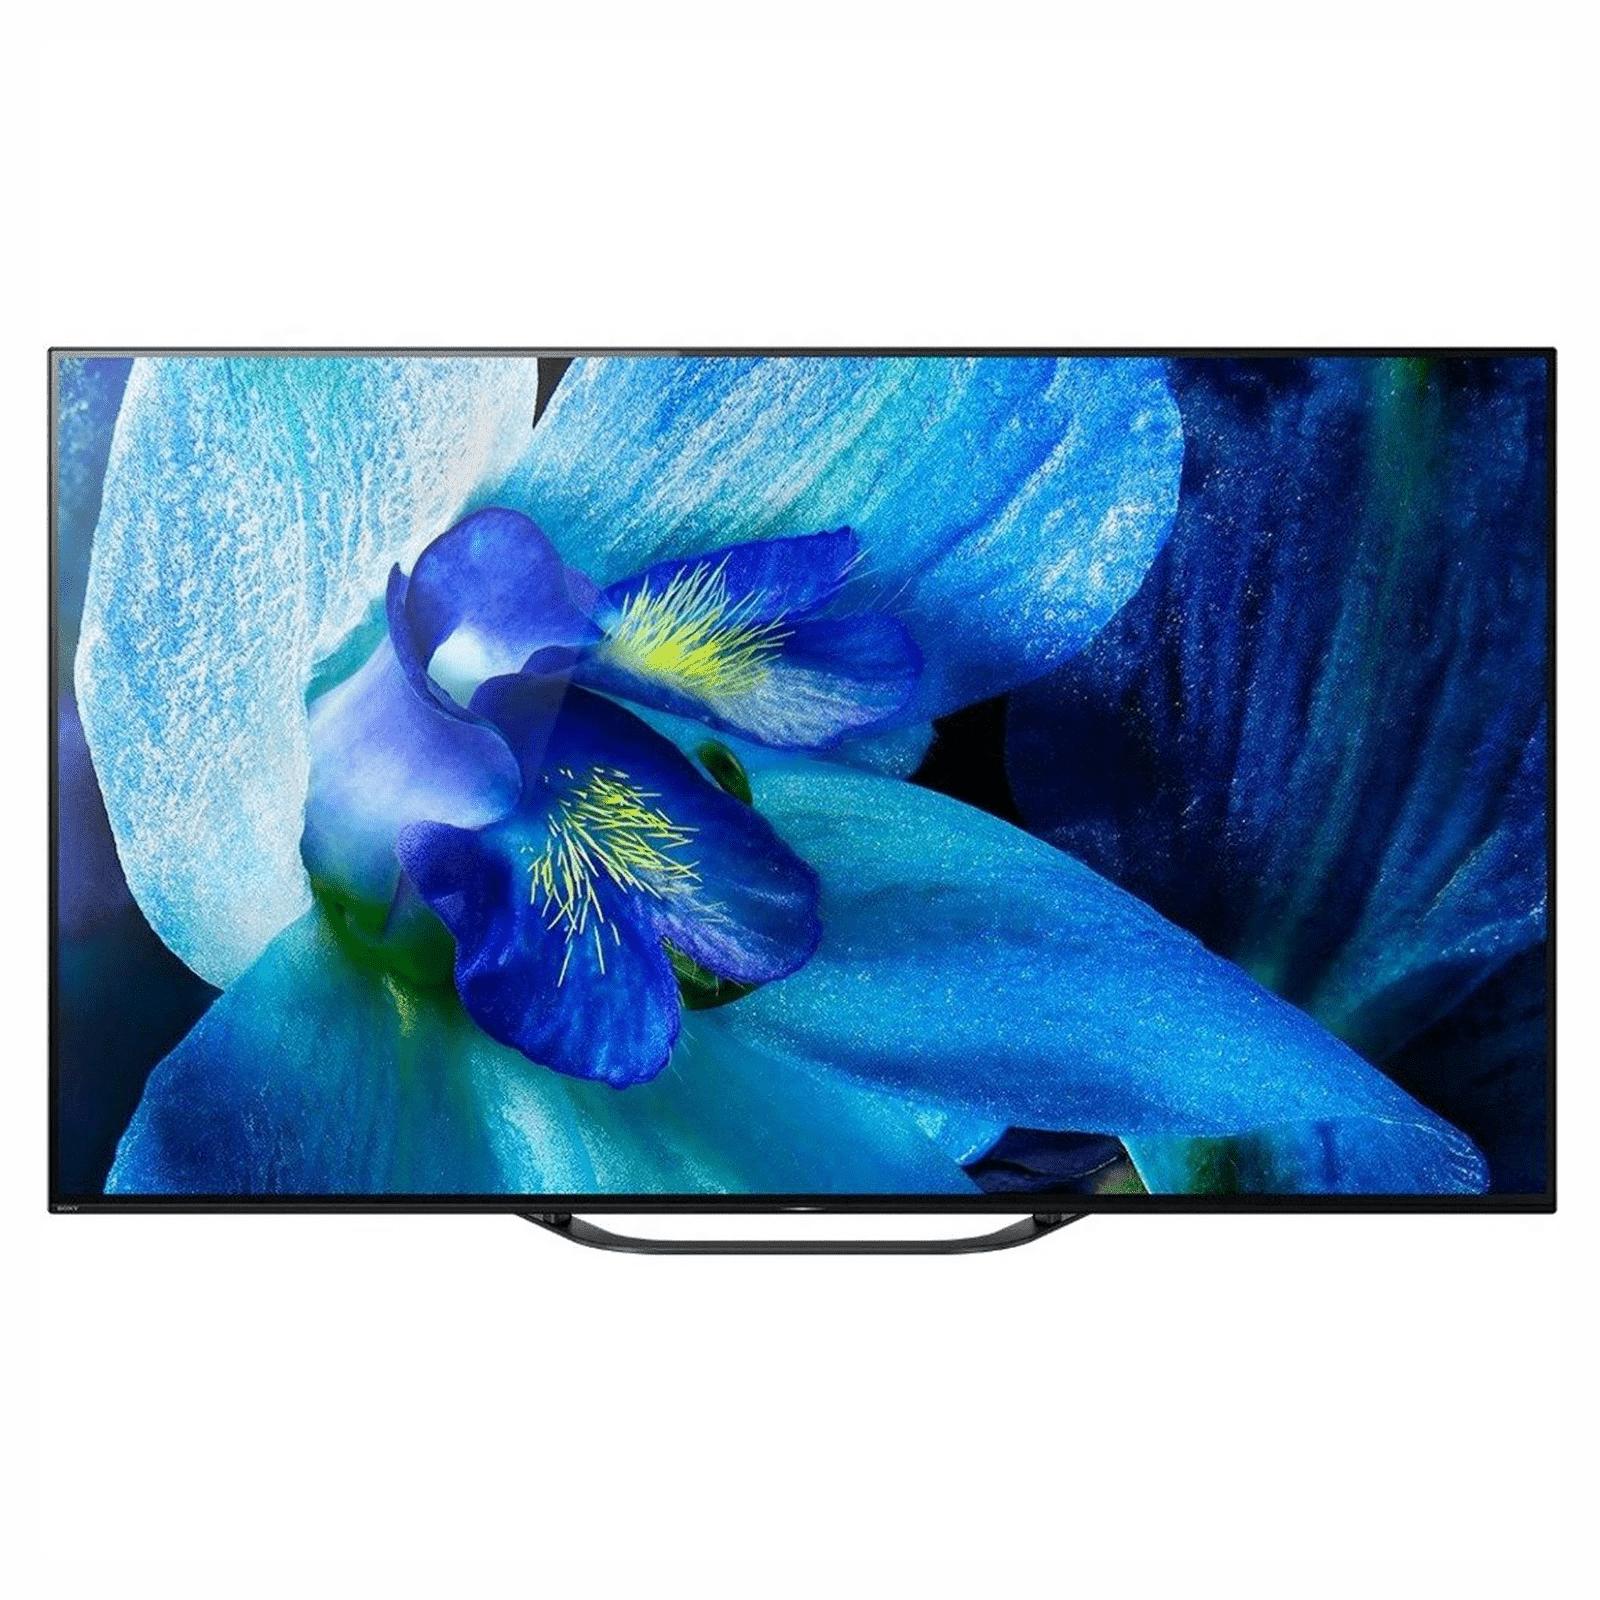 Sony Bravia KD65AG8BU OLED HDR 4K Ultra HD 2019 model £2399.98 @ Costco - In store deal 10th - 23rd June 2019